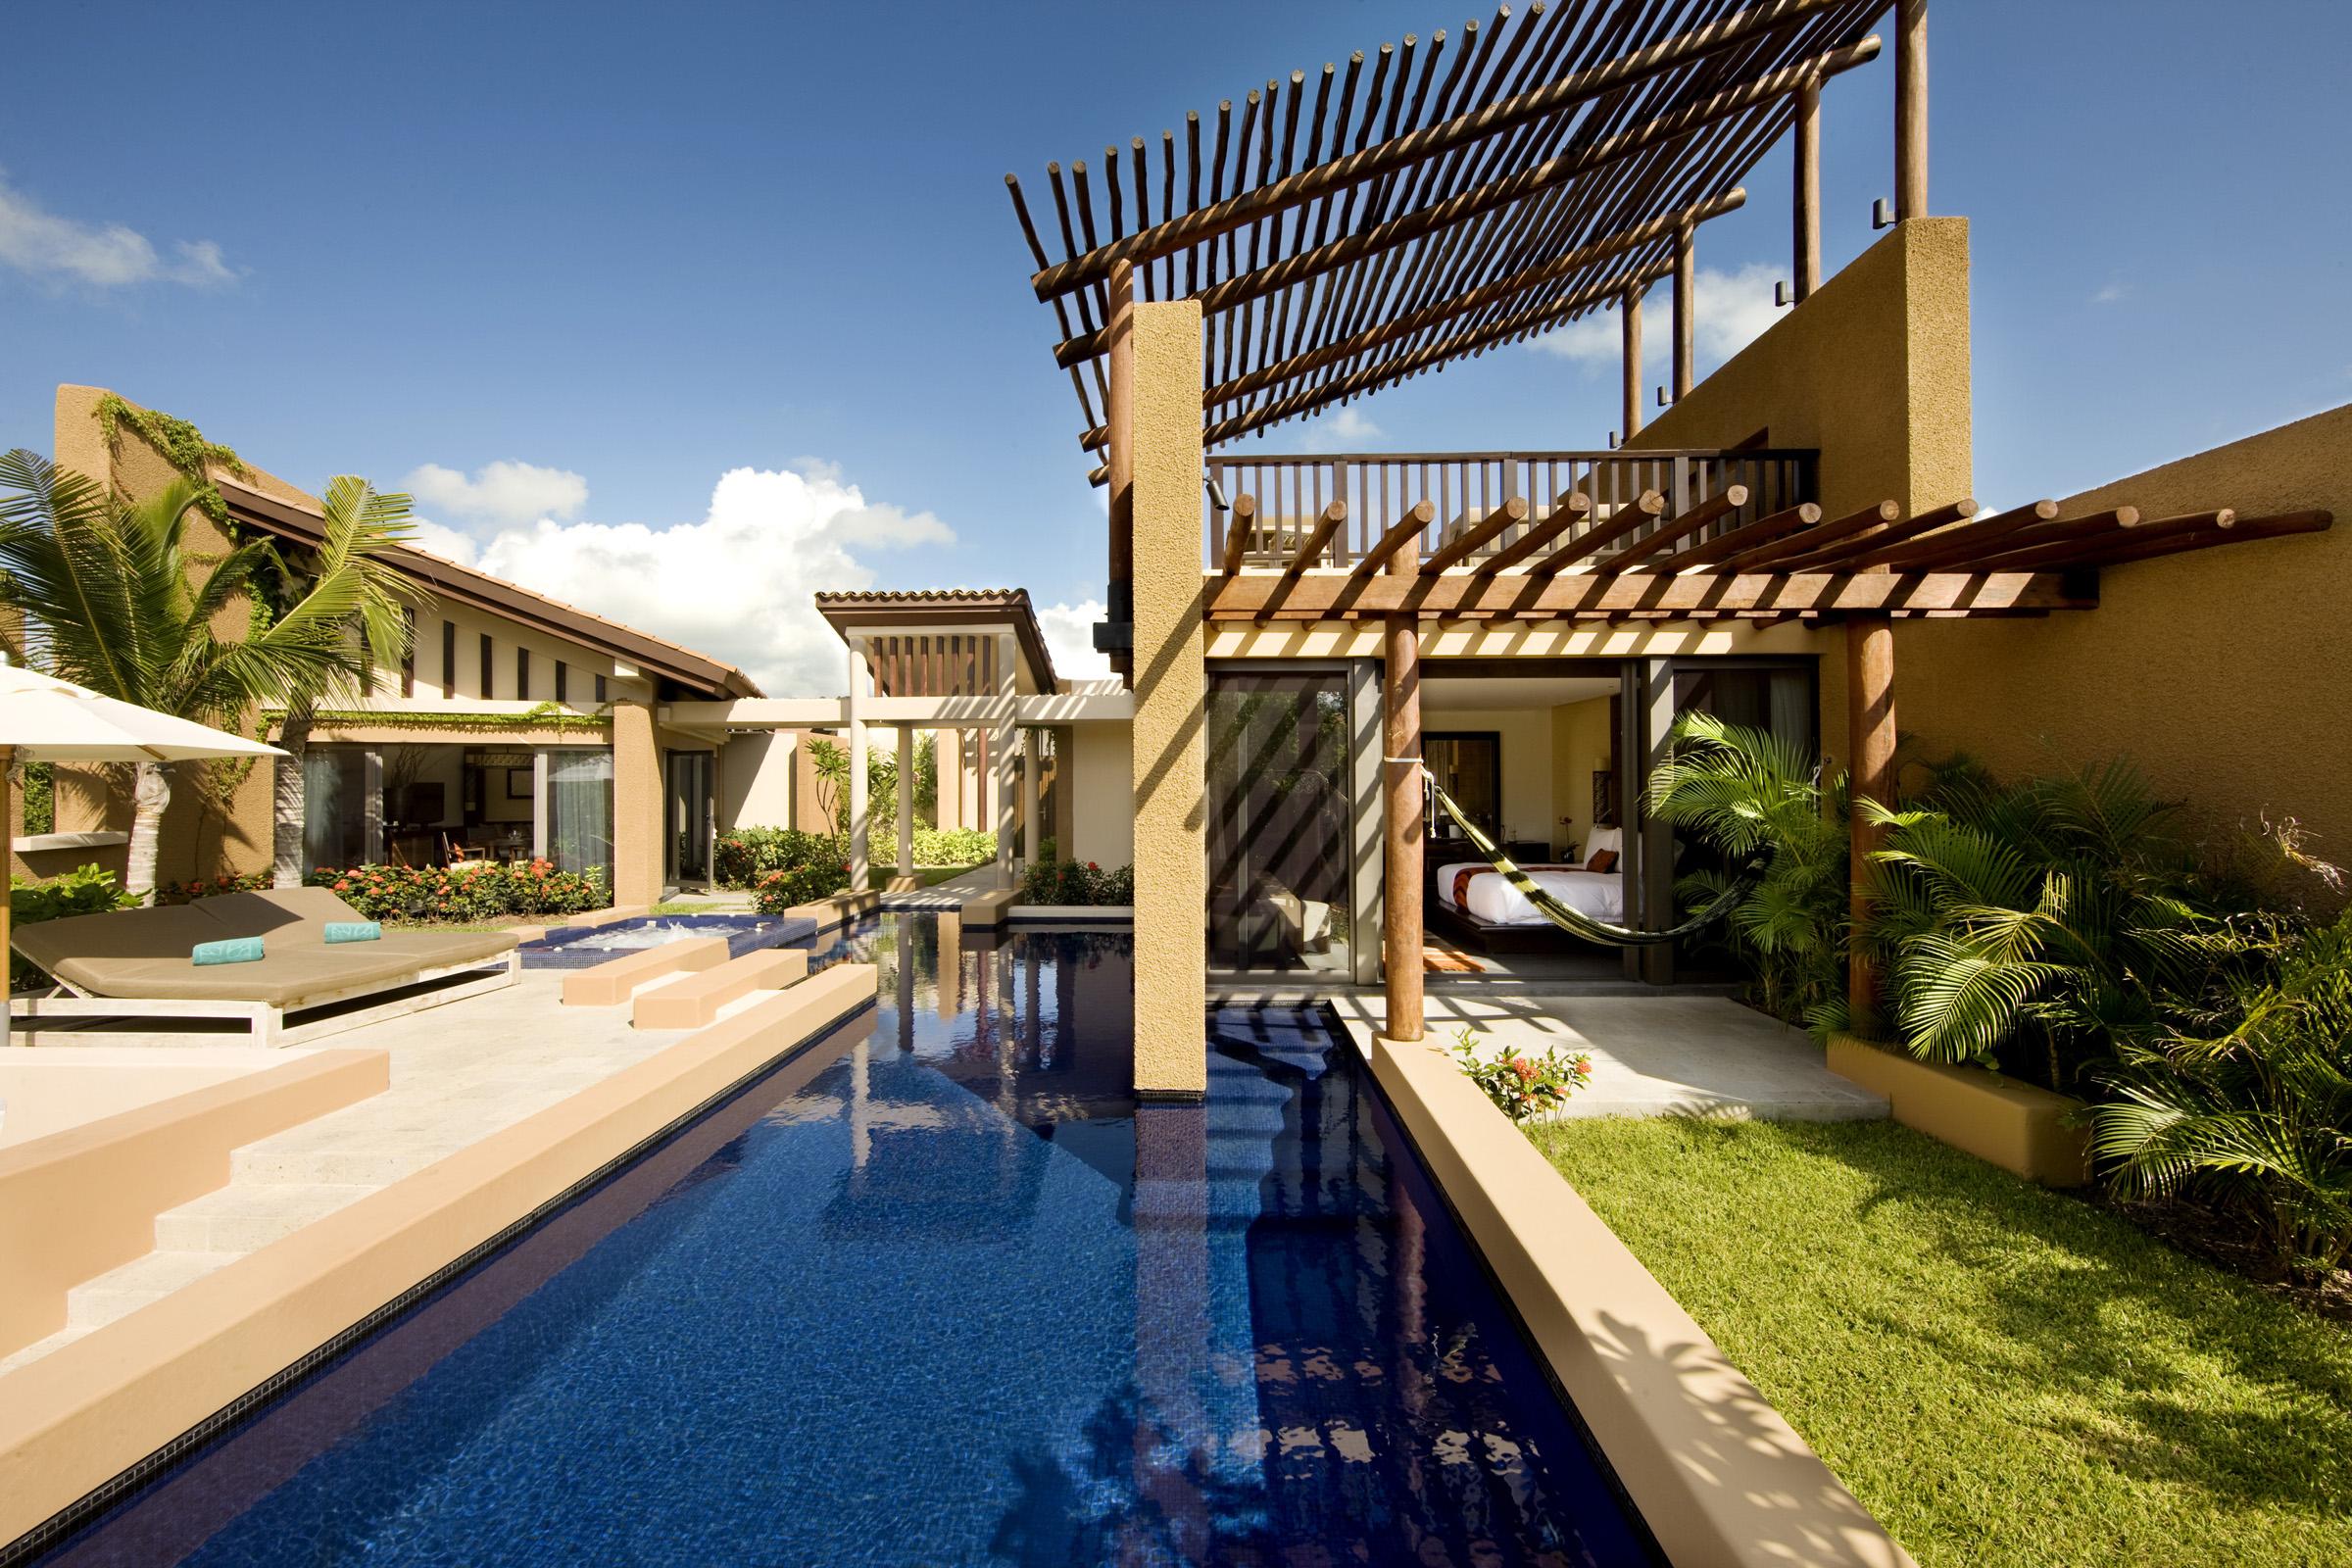 Spa_Pool_Villa_Pool_Banyan_Tree